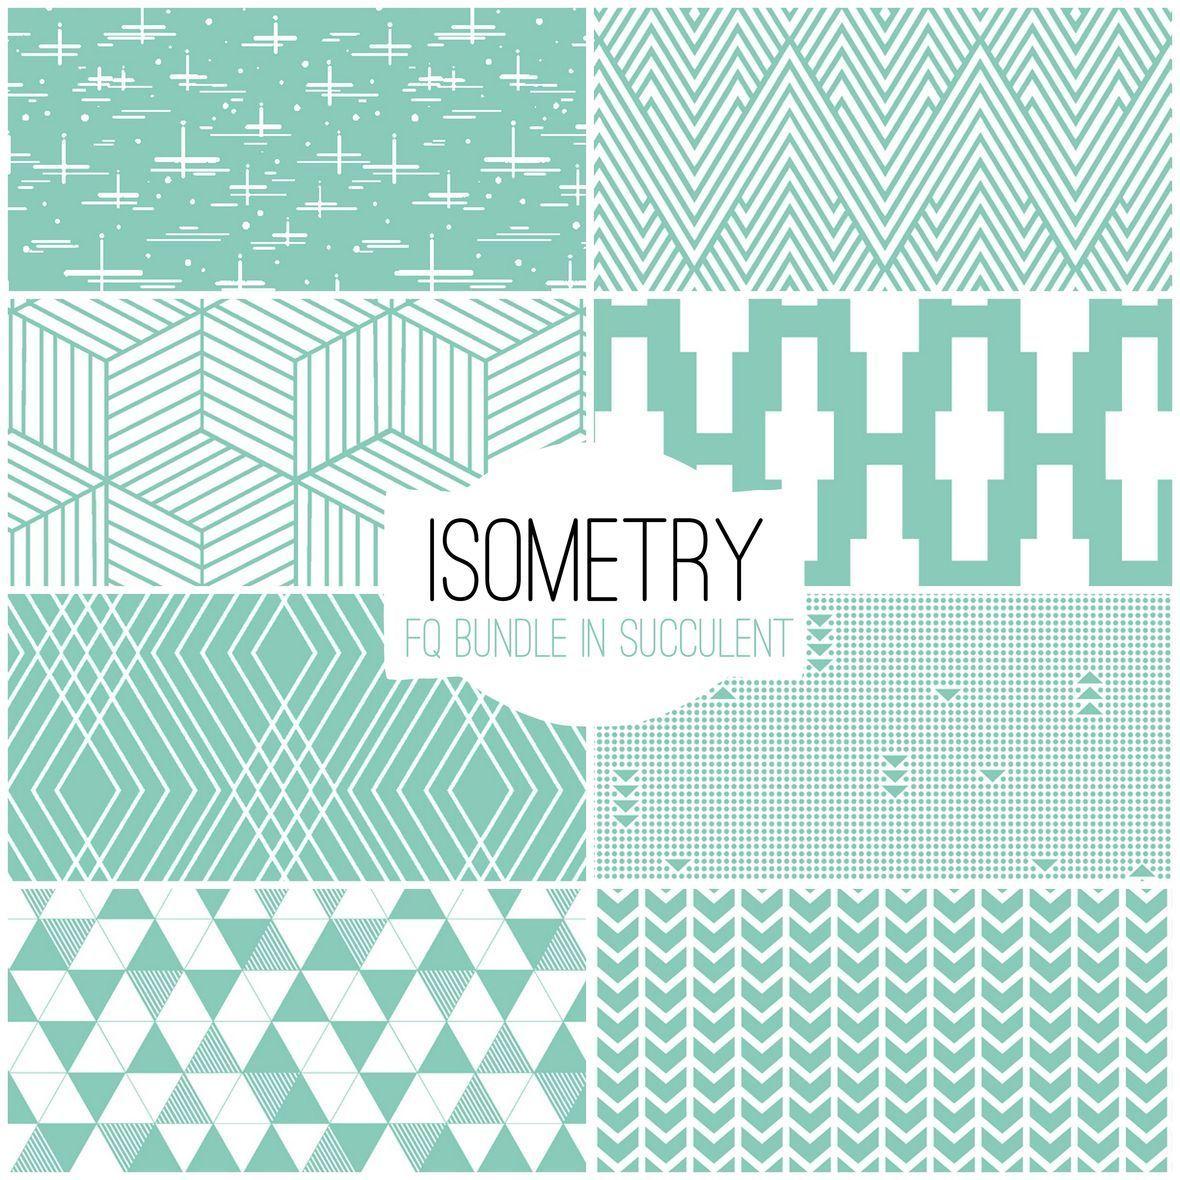 Isometry in Succulent